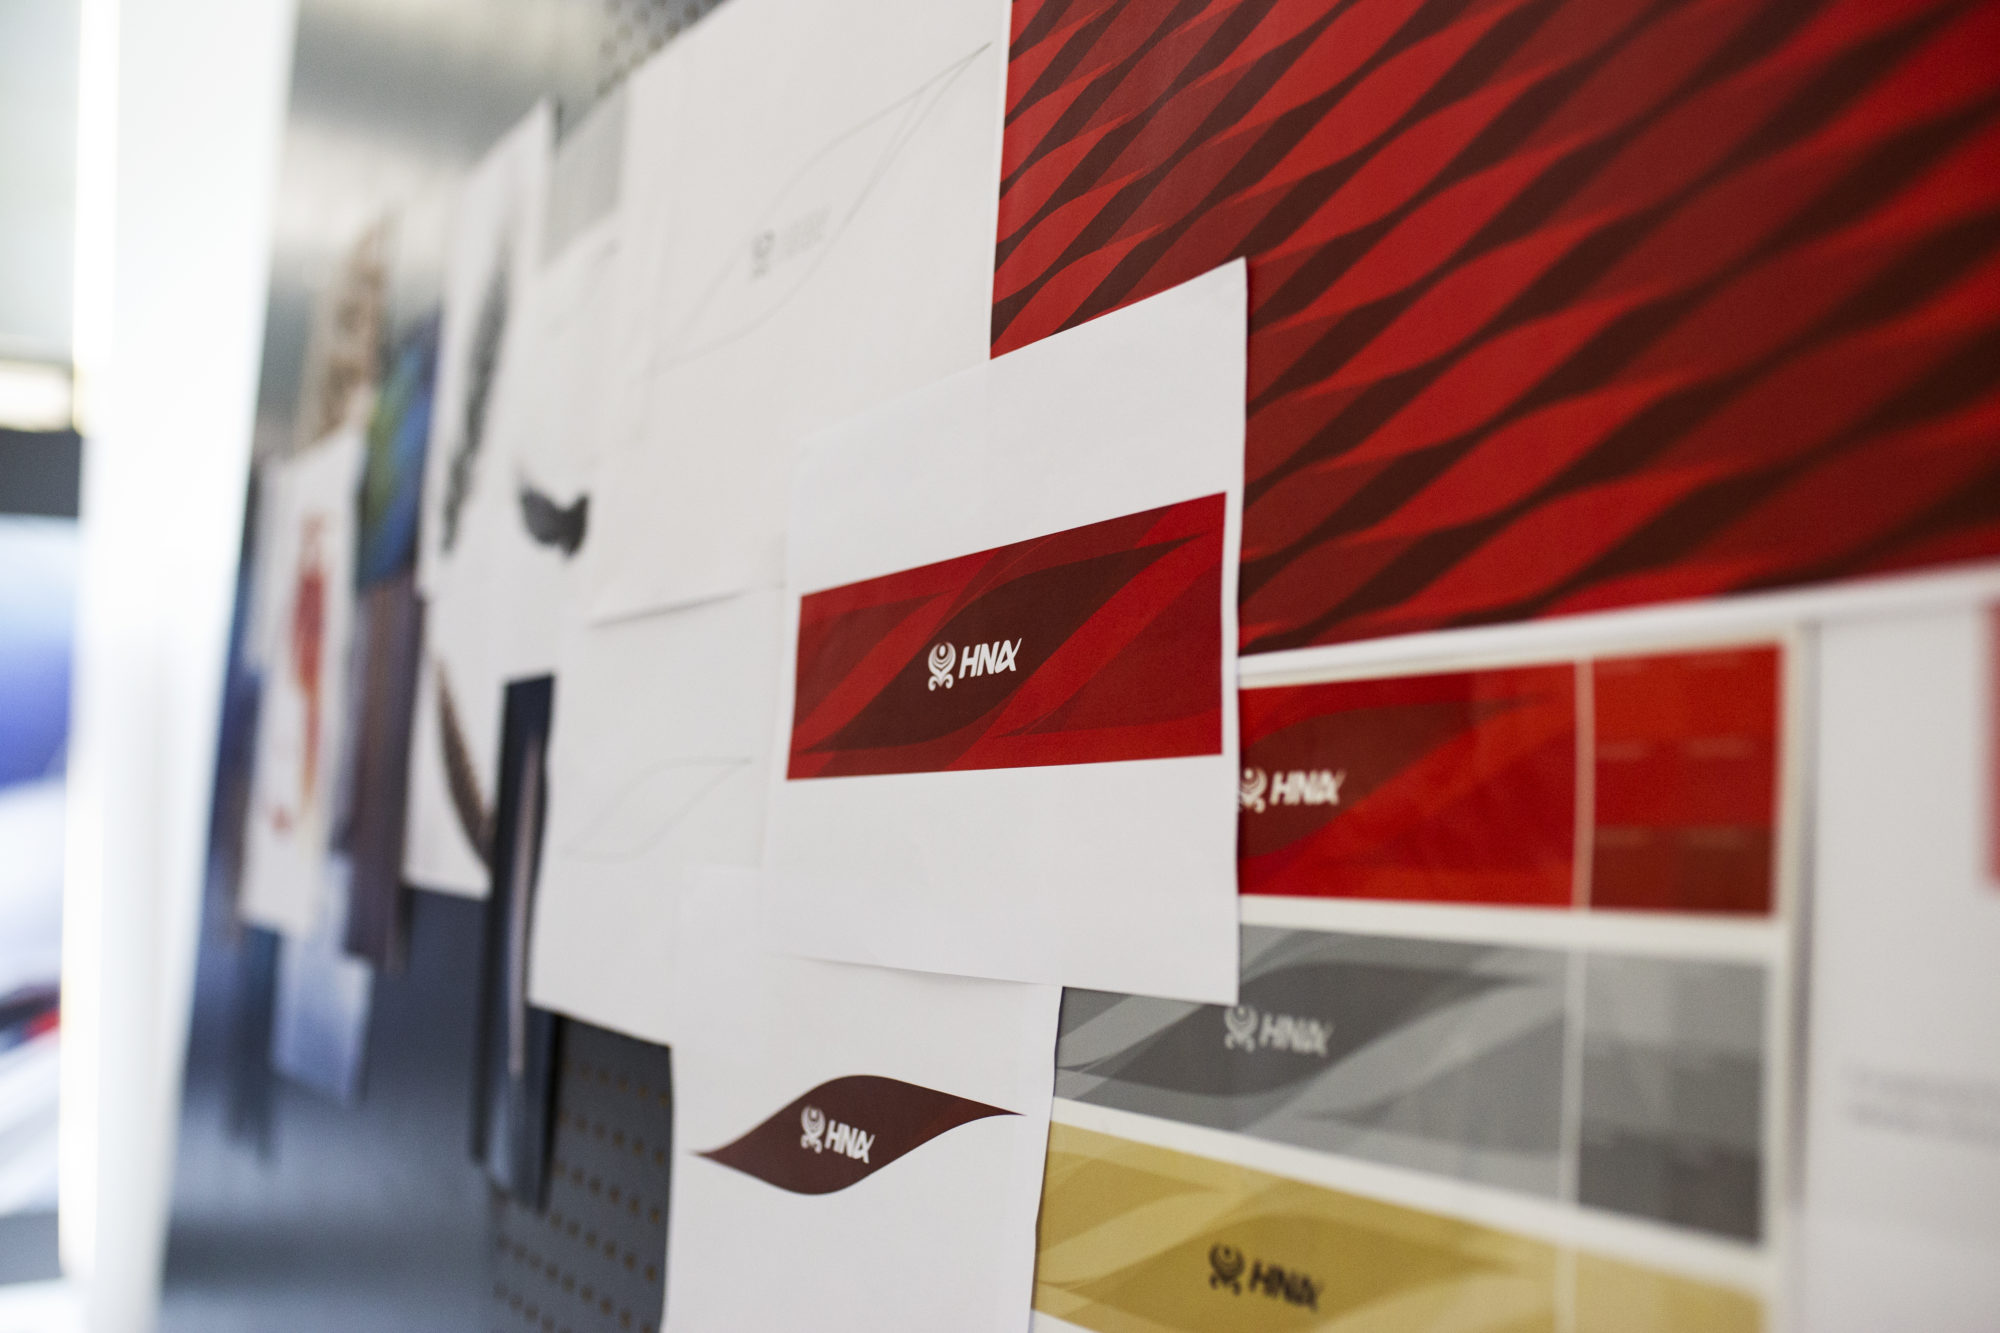 Wall of HNA branding